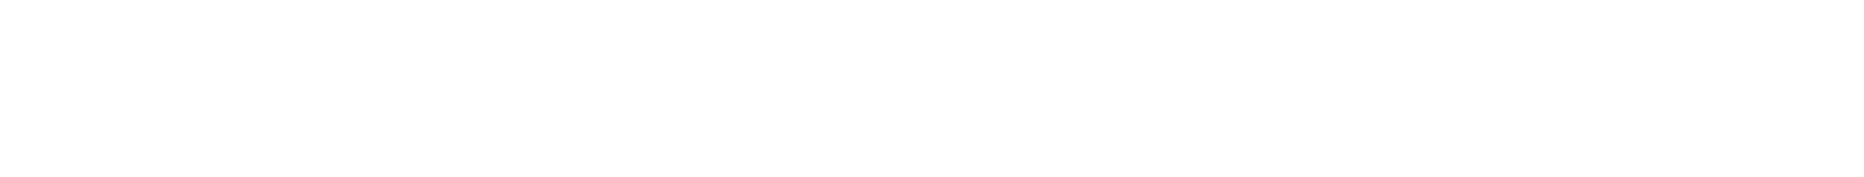 Logo_Kanzlei_Lorenz_Arndt_Quer_white